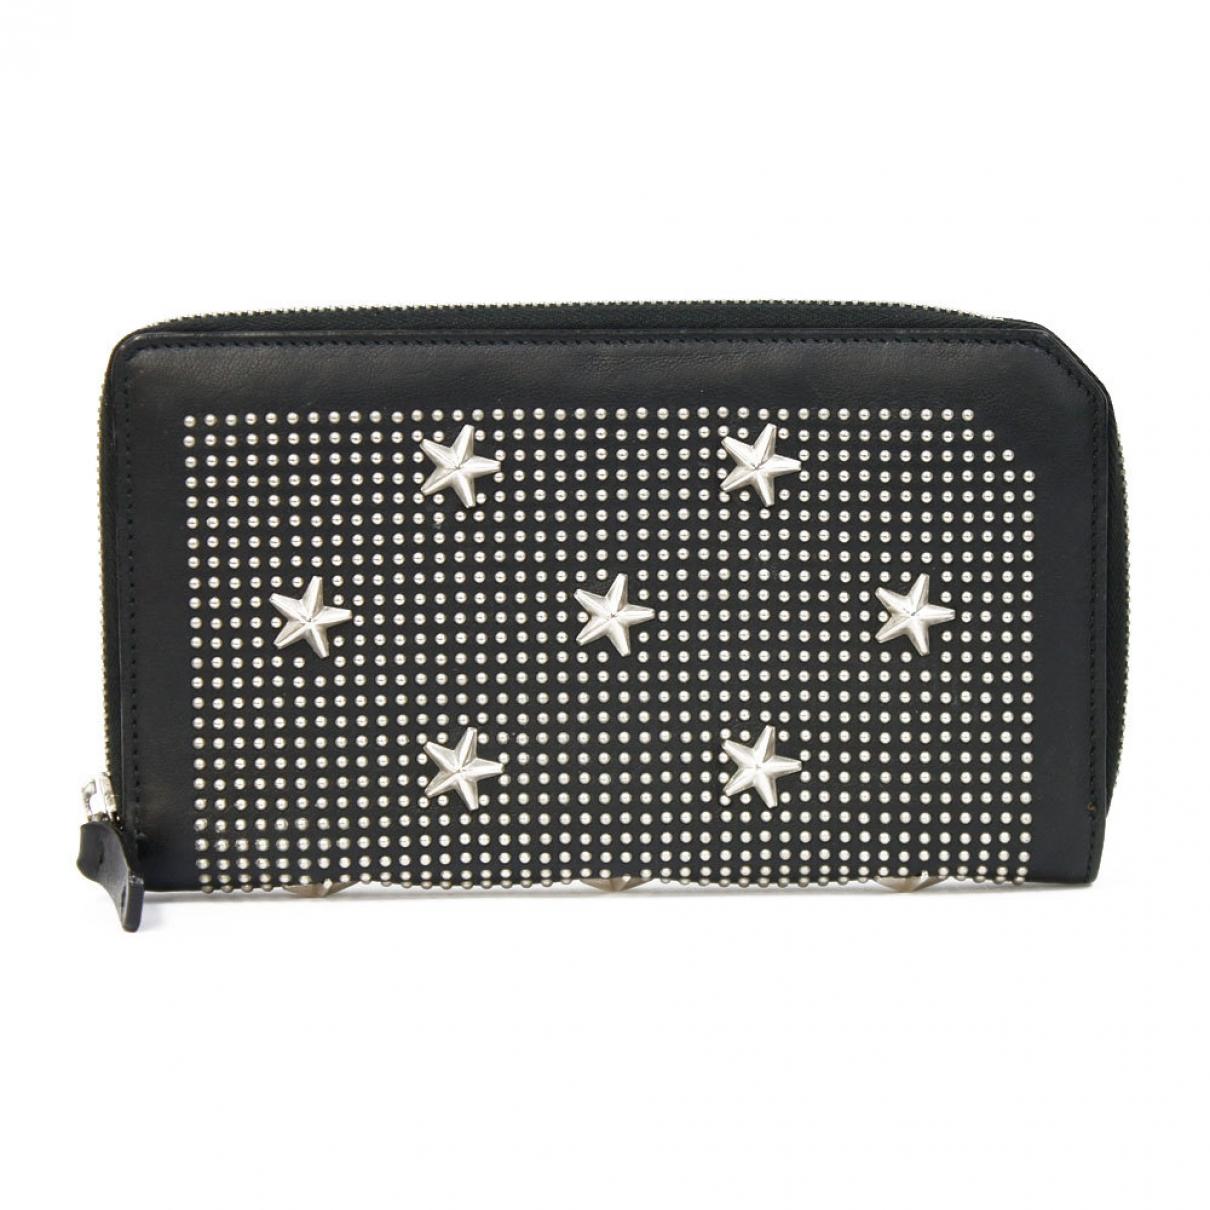 Jimmy Choo N Black Leather wallet for Women N